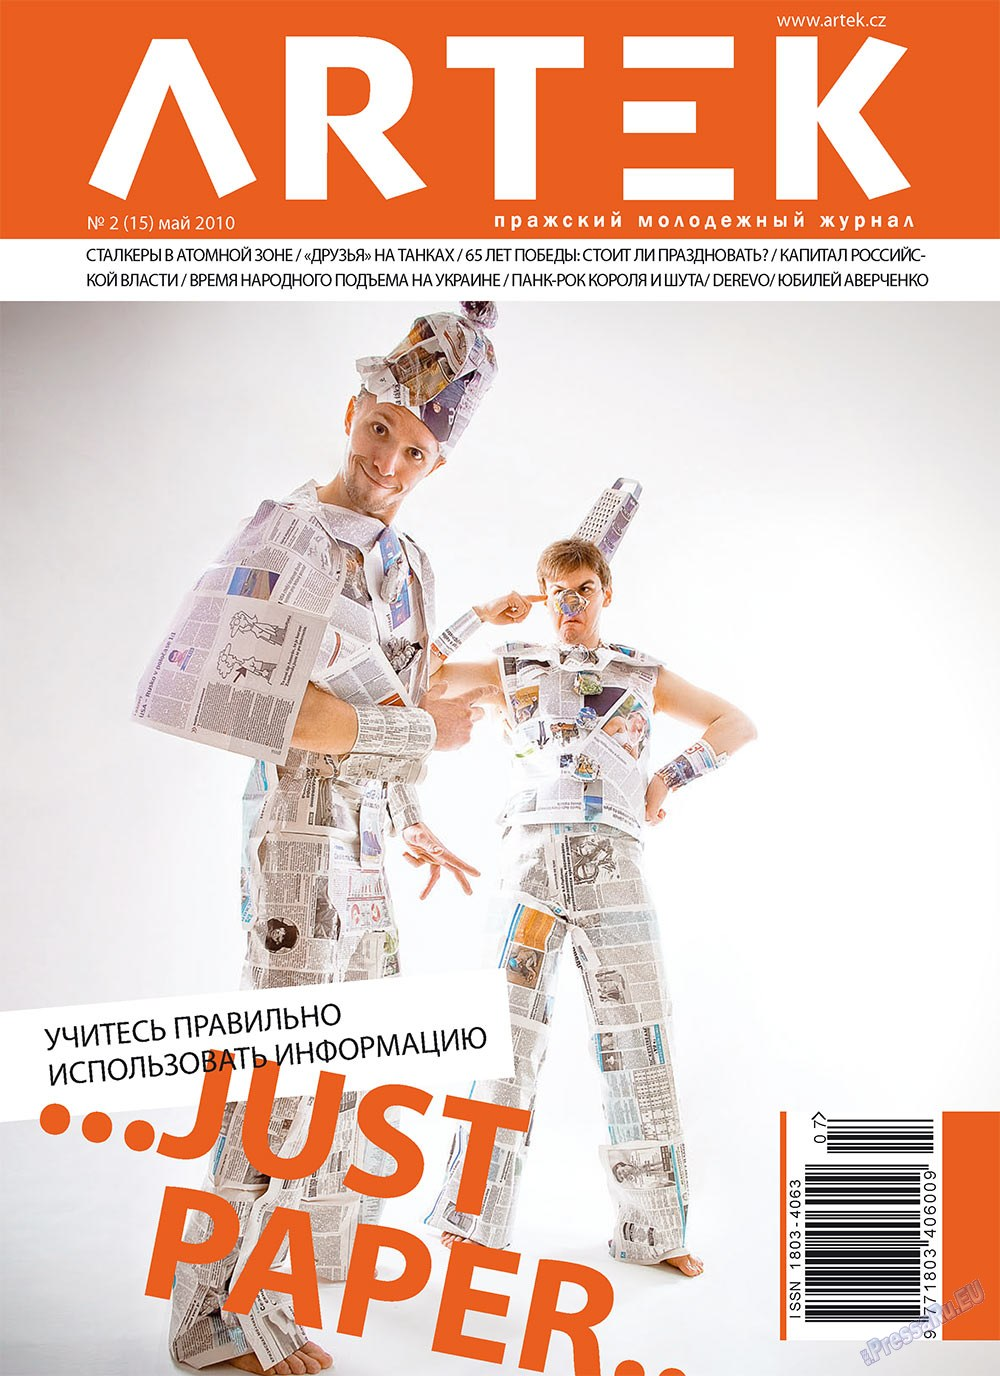 Артек (журнал). 2010 год, номер 2, стр. 1